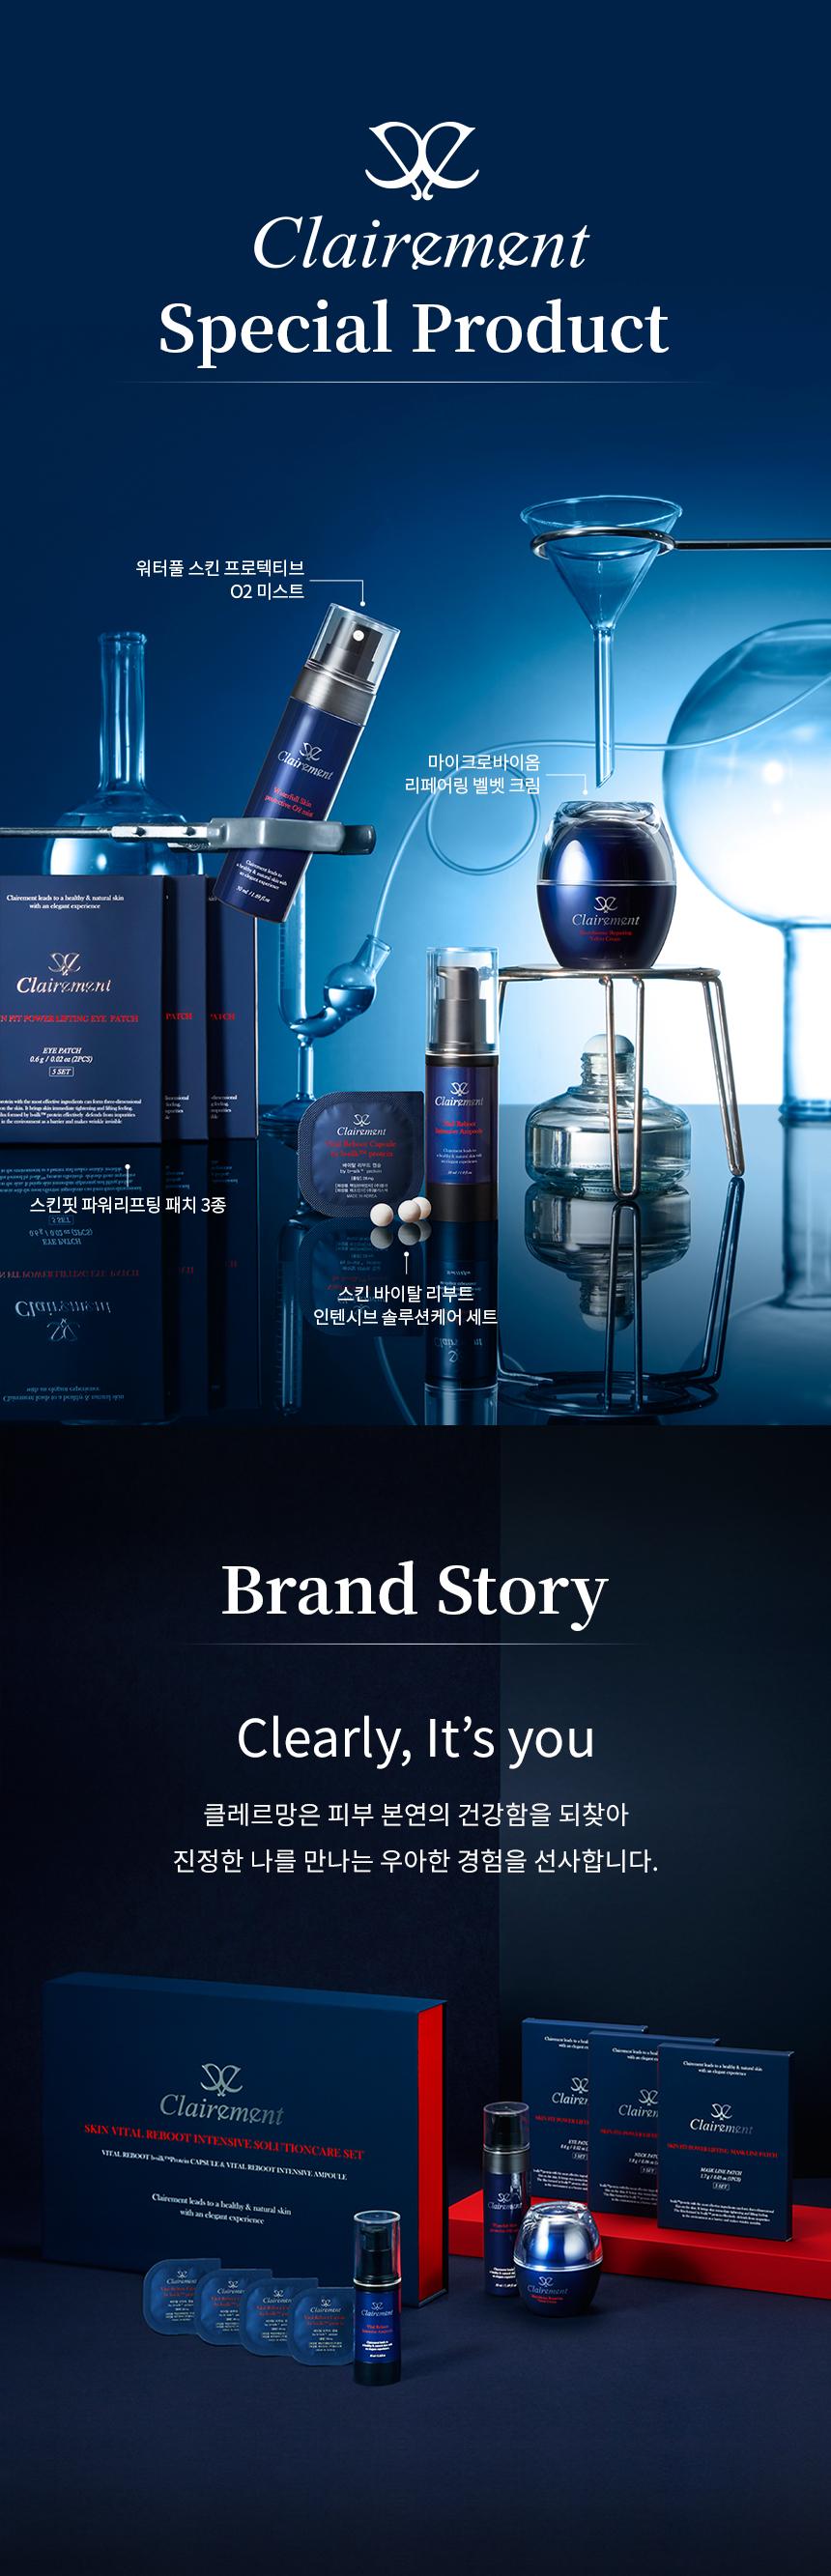 _clairement_9_brandstory_.jpg